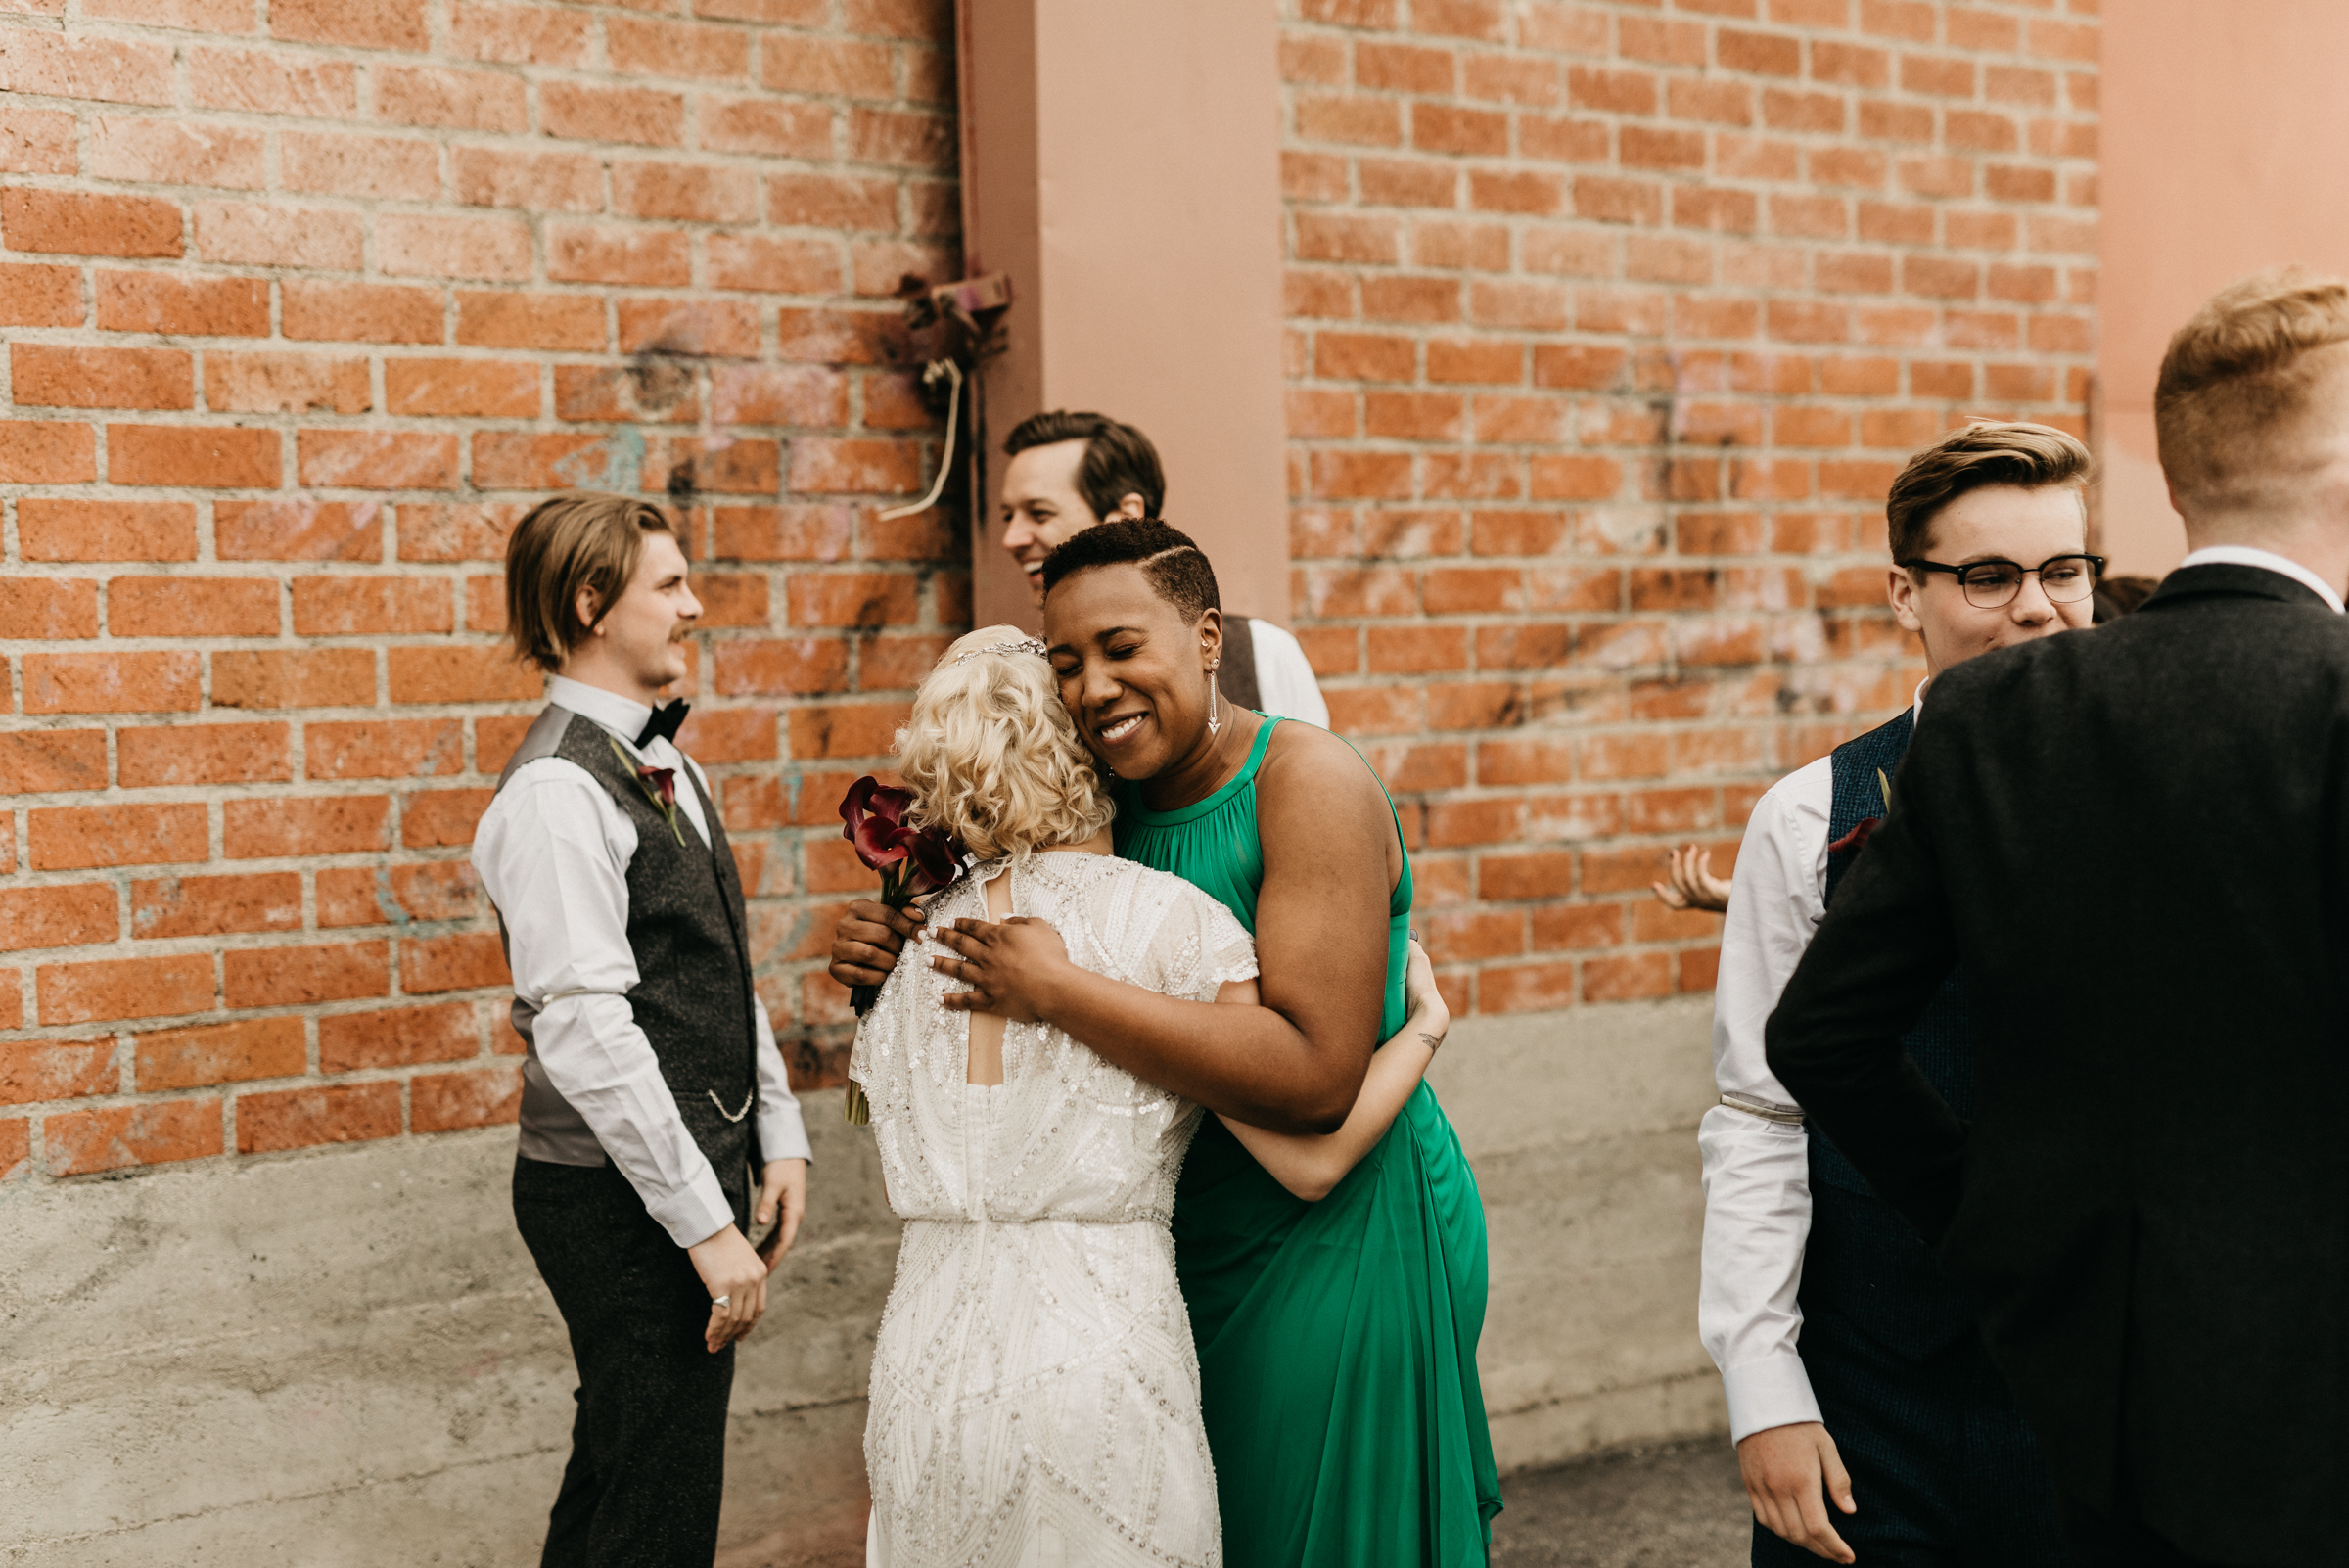 ©Isaiah + Taylor Photography - Studio 11 Wedding, Los Angeles Wedding Photographer-105.jpg